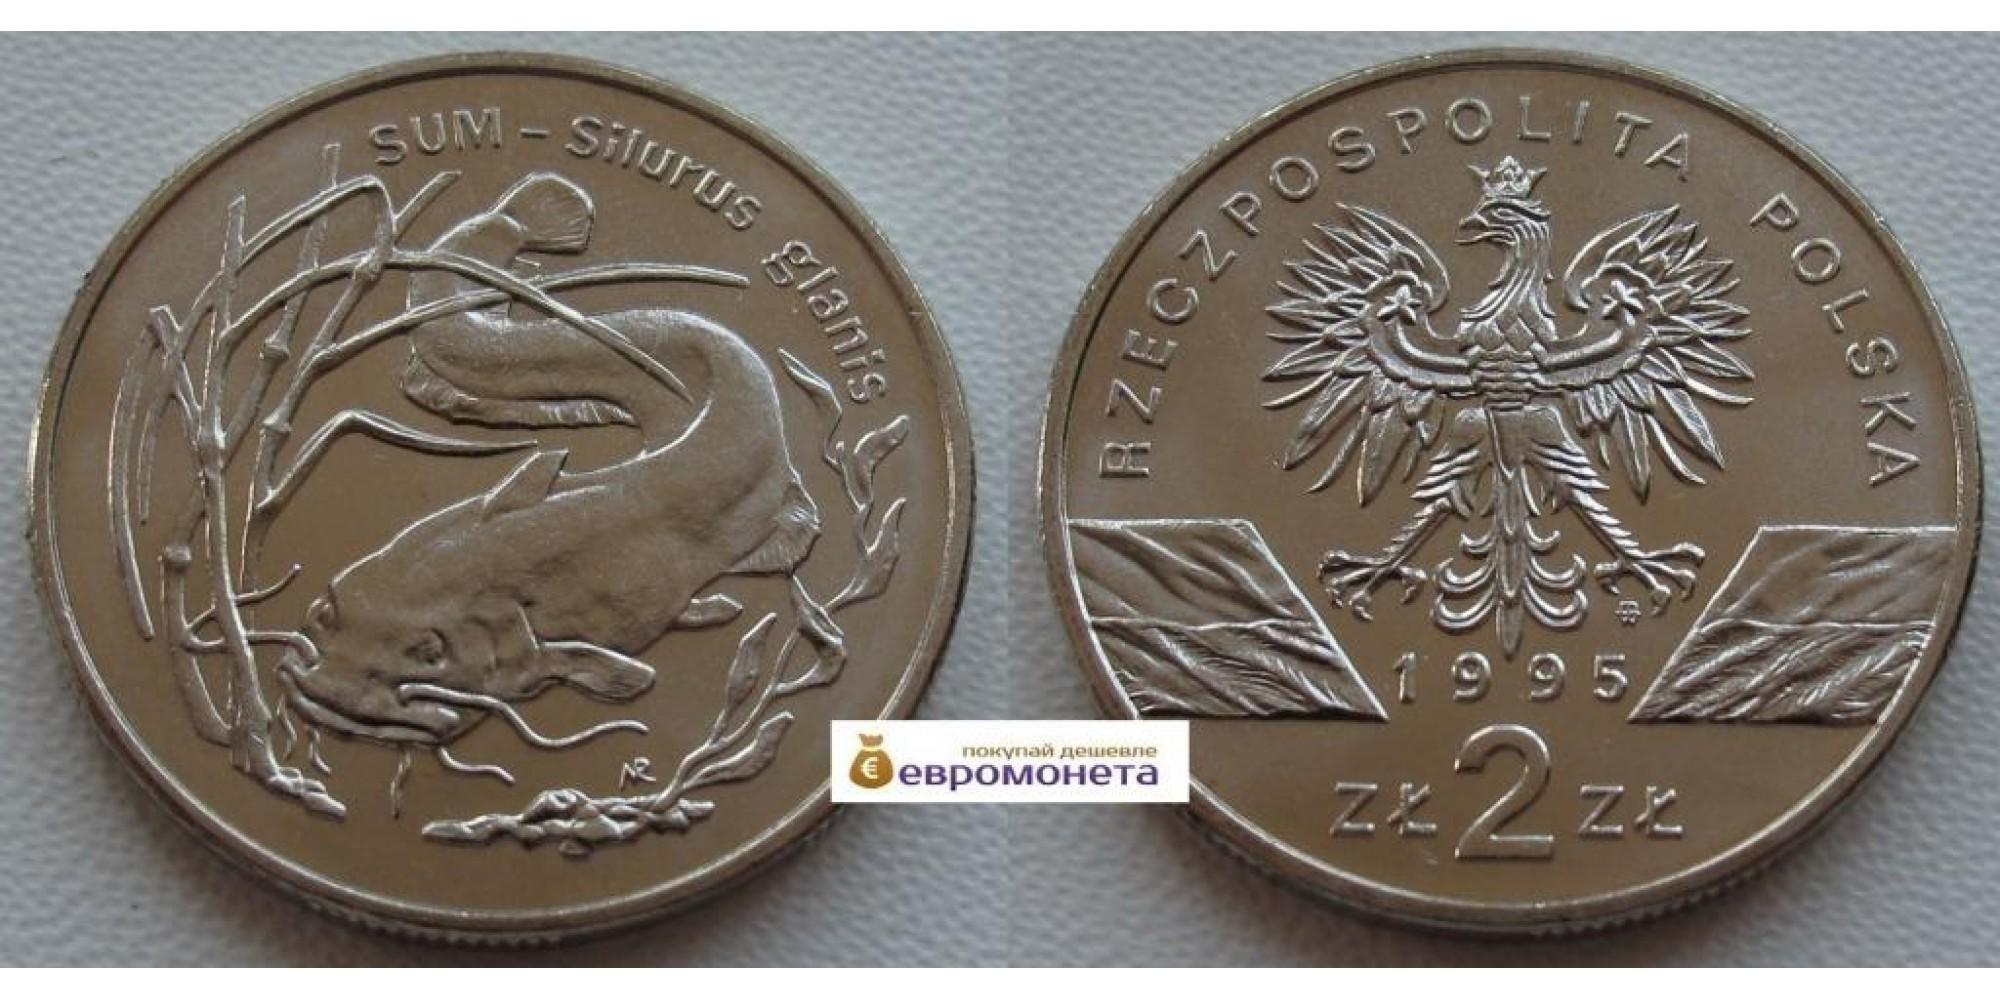 Польша 2 злотых 1995 год, Сом (LAC- Silurus glanis)